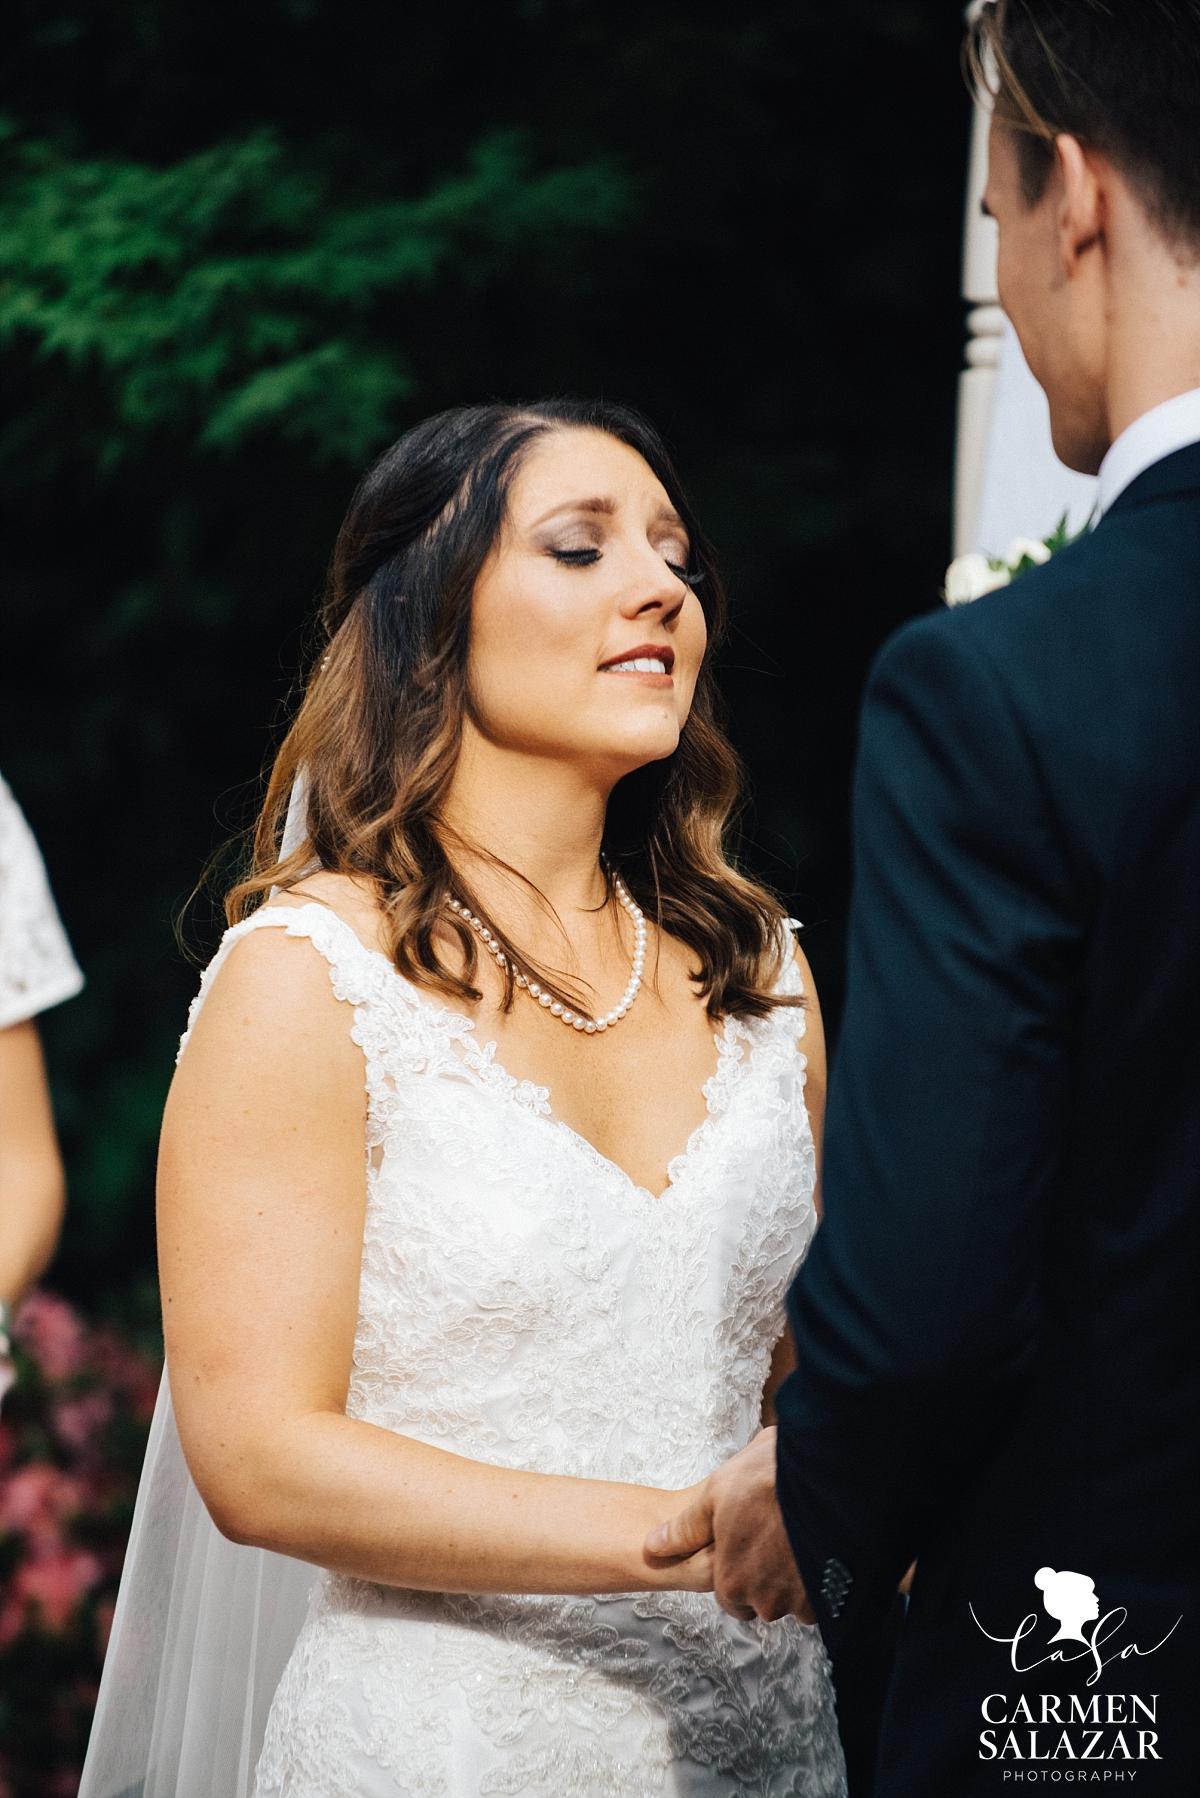 Emotional bride during ceremony - Carmen Salazar